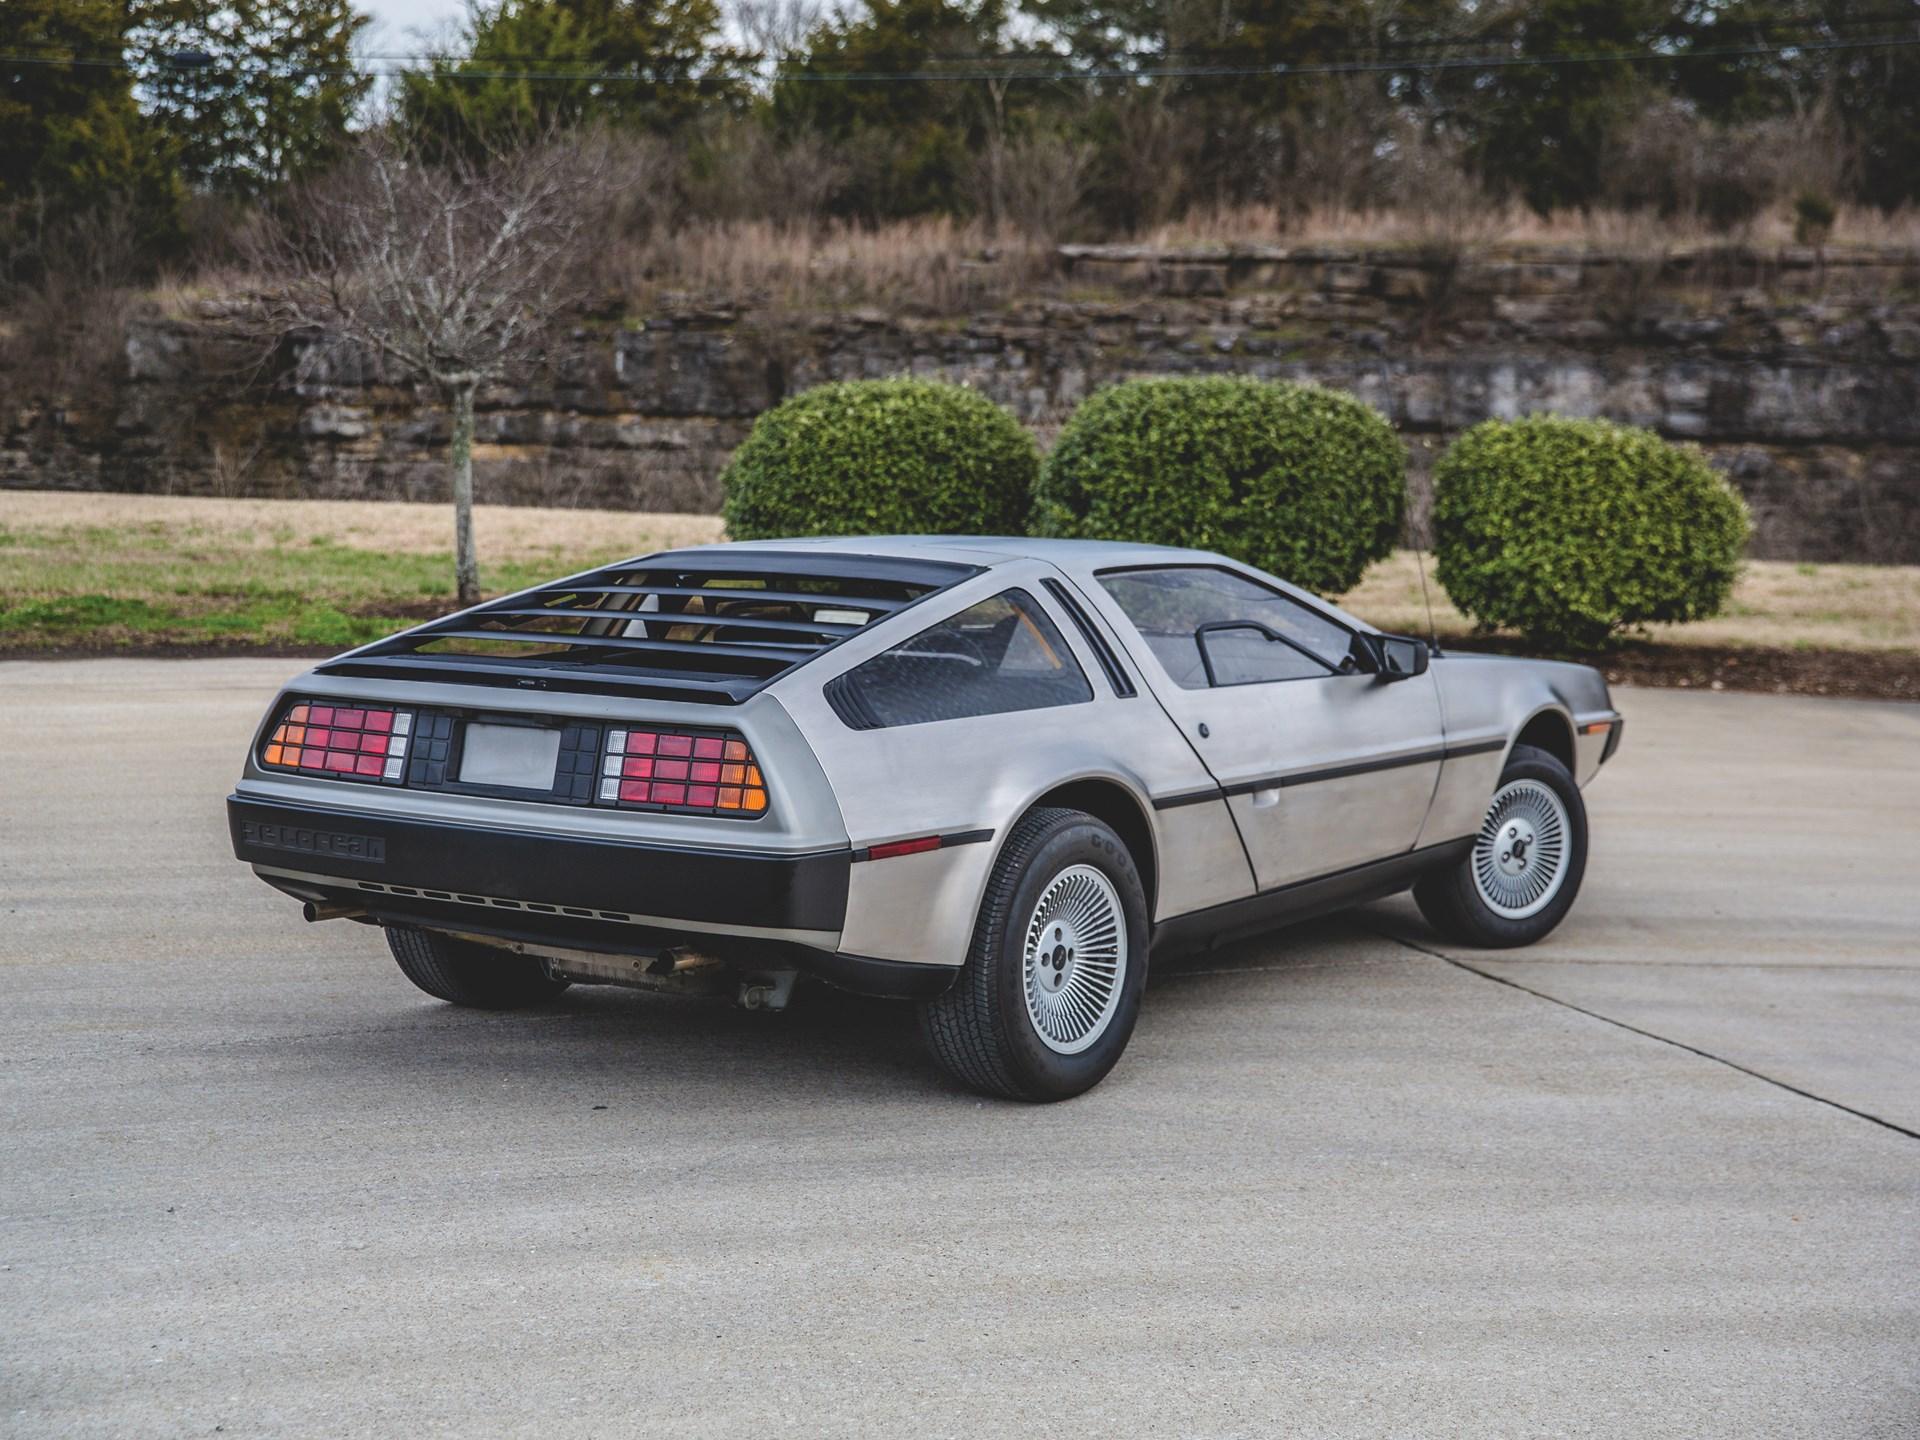 1981 DeLorean DMC-12 3/4 rear